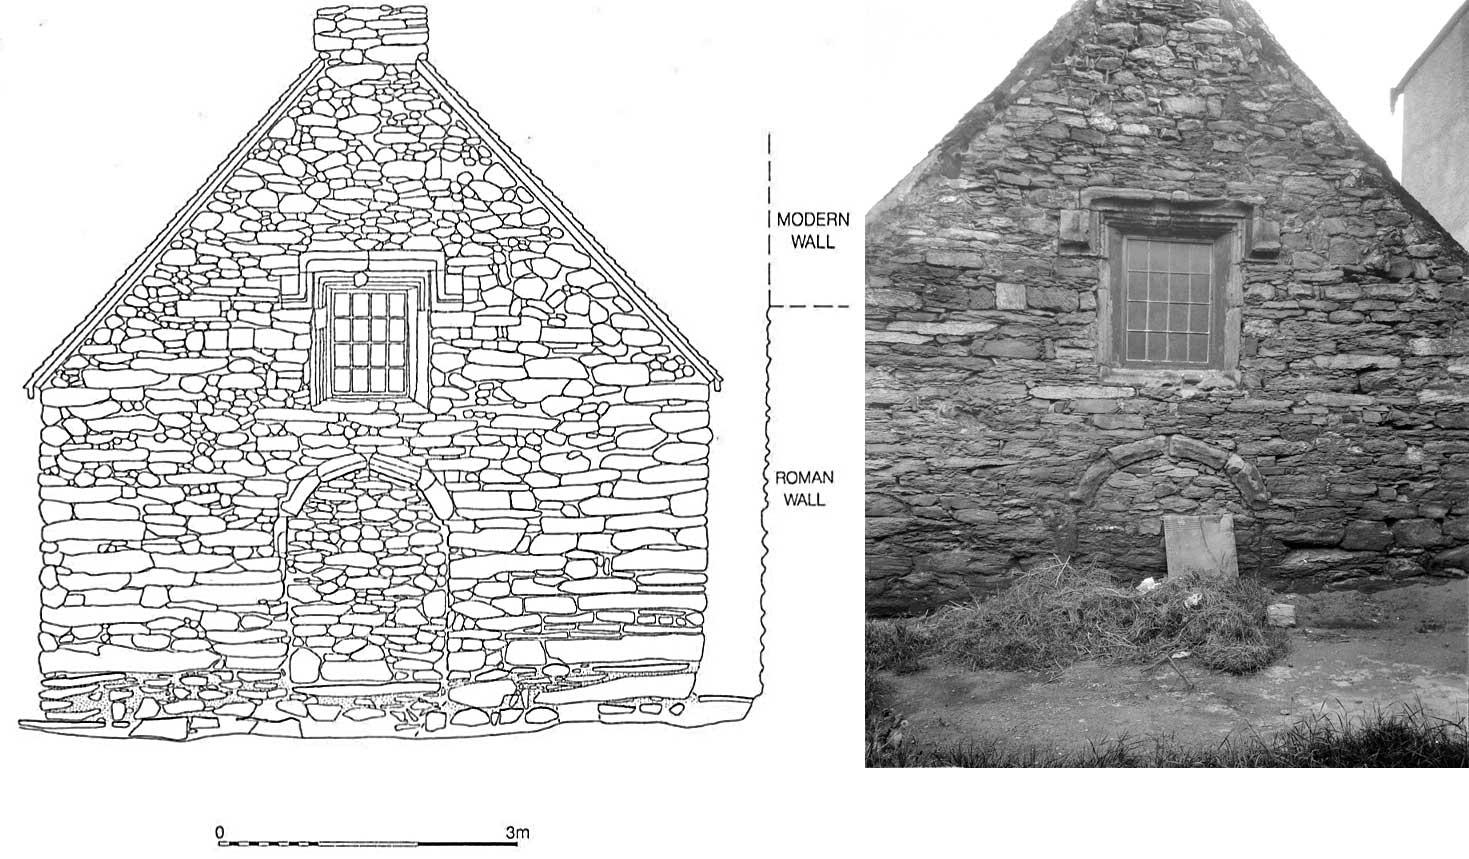 36-Eglwys-y-Bedd-combined-tiny